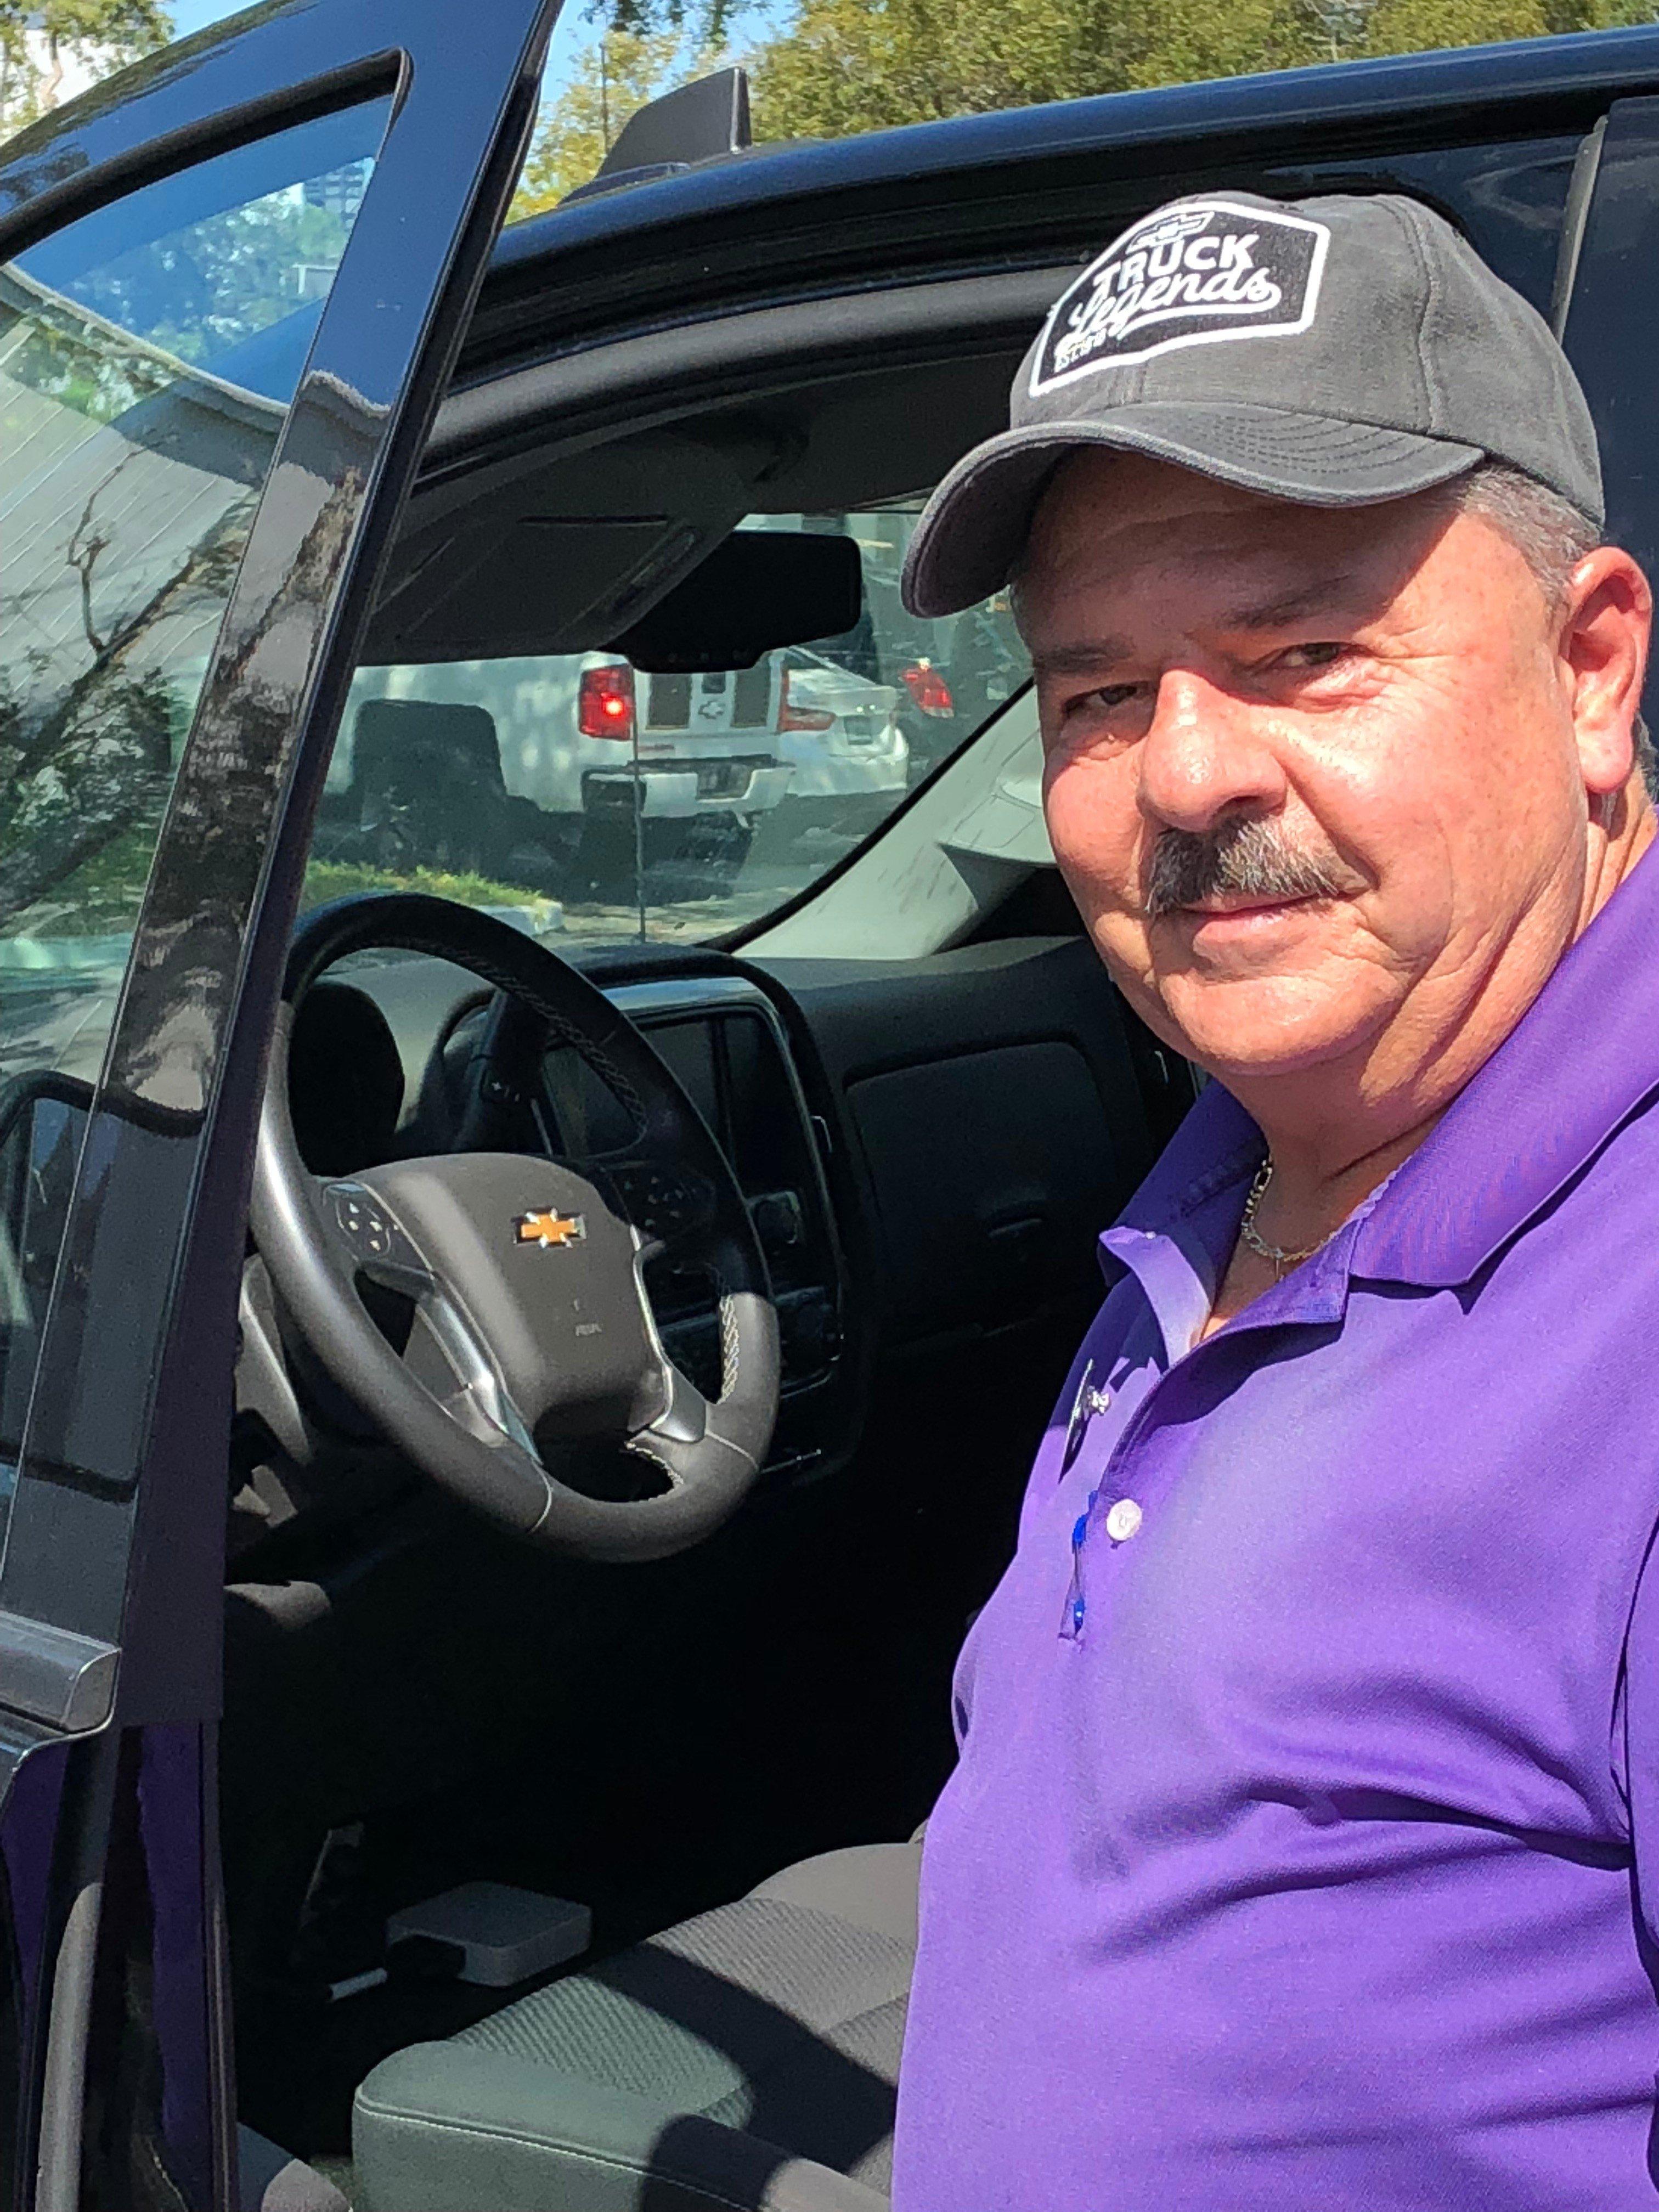 Chevy Truck Legend Mark McIntyre Clearwater FL